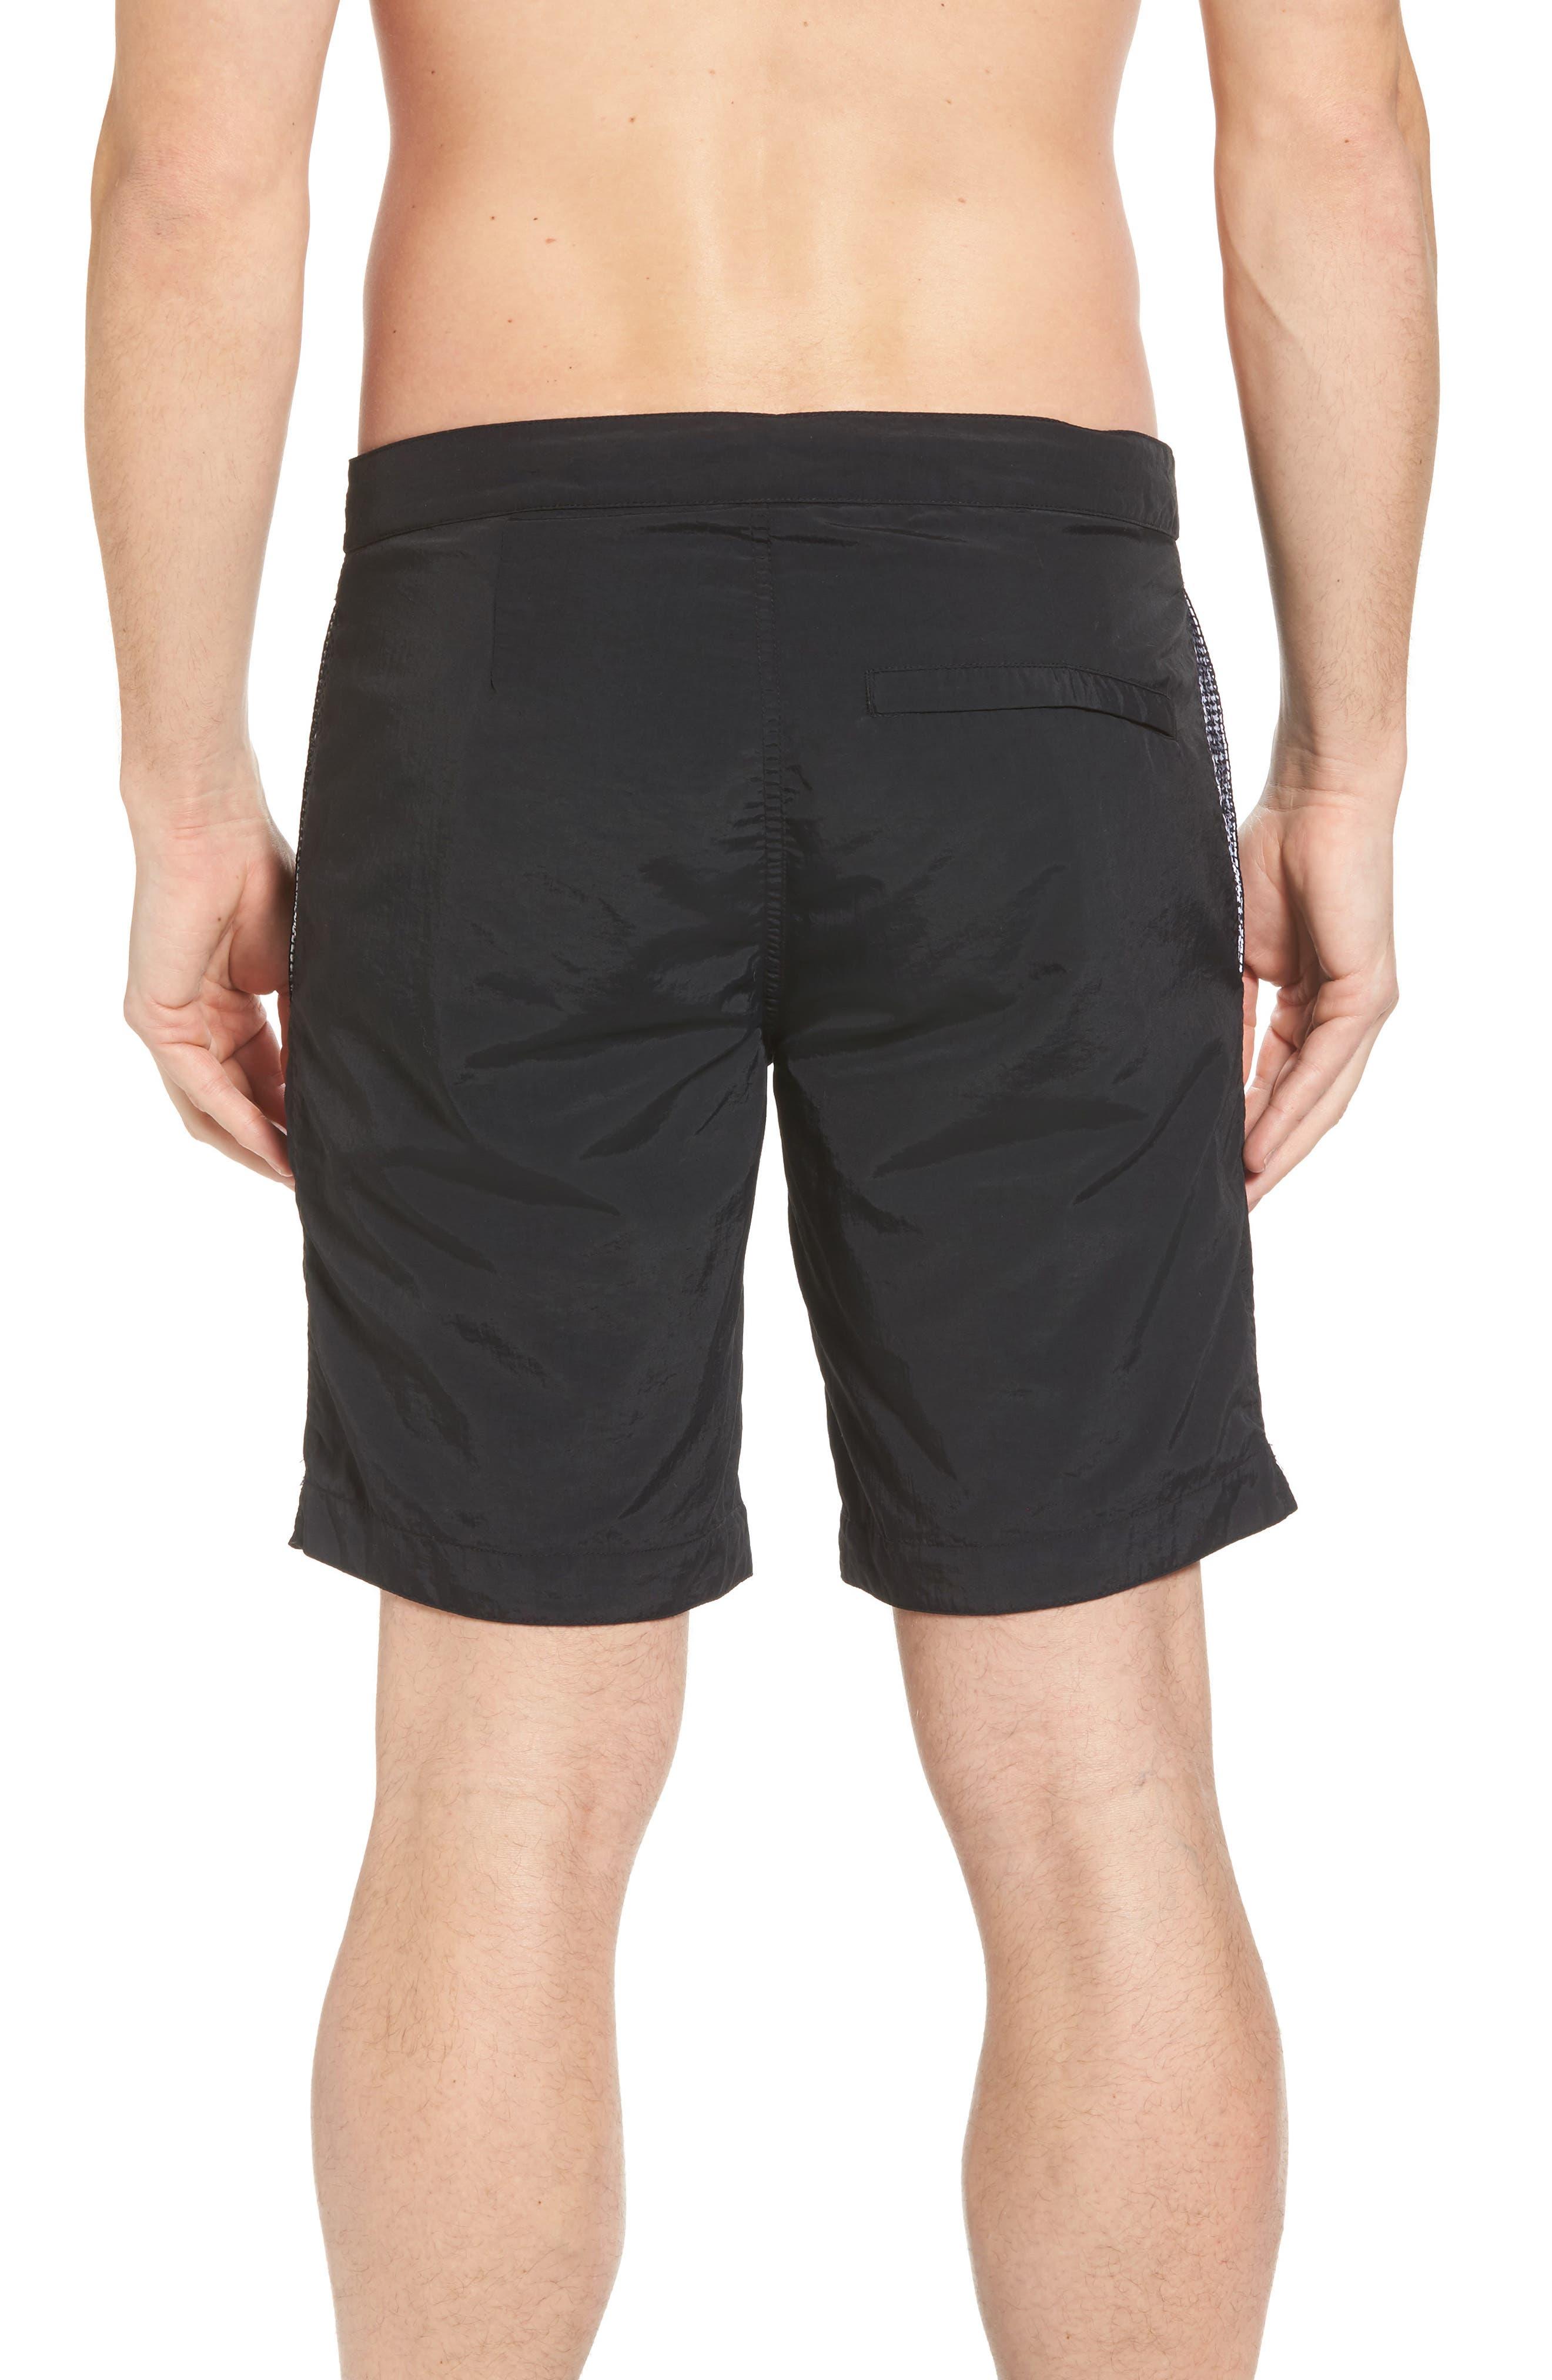 'Aruba - Island' Tailored Fit 8.5 Inch Board Shorts,                             Alternate thumbnail 6, color,